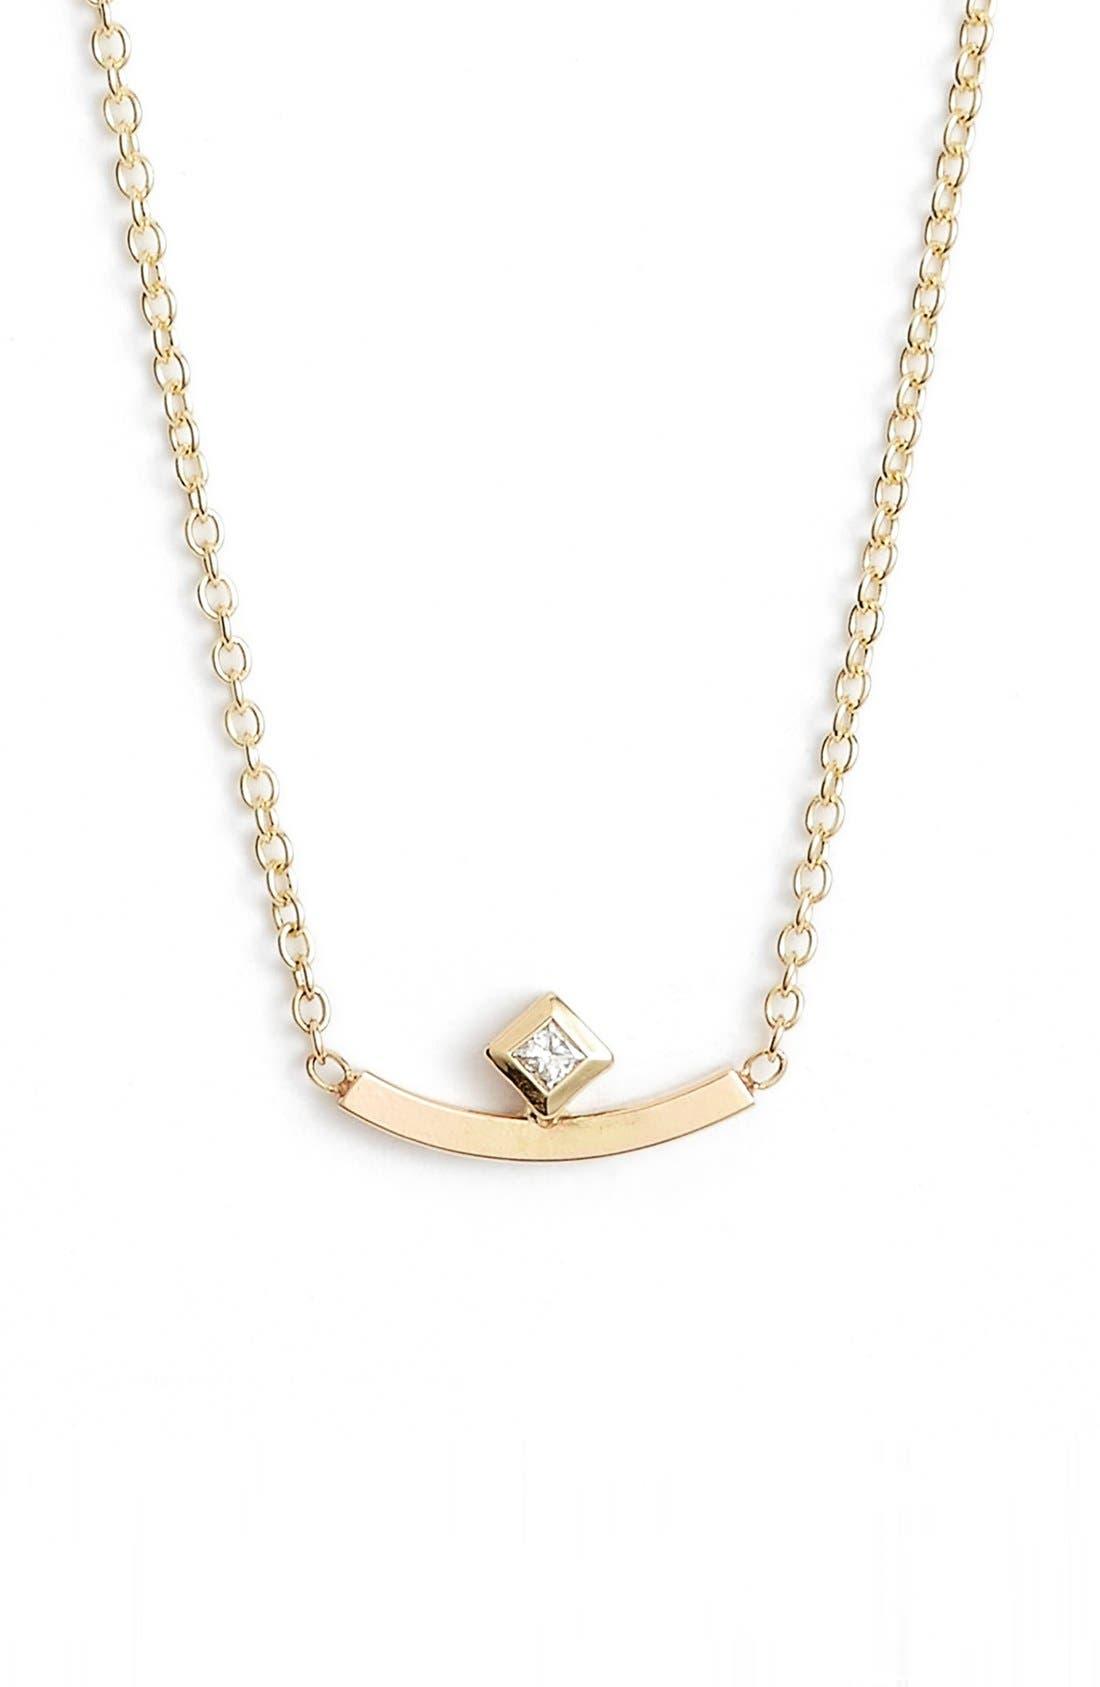 Zoë Chicco Diamond Curved Bar Necklace